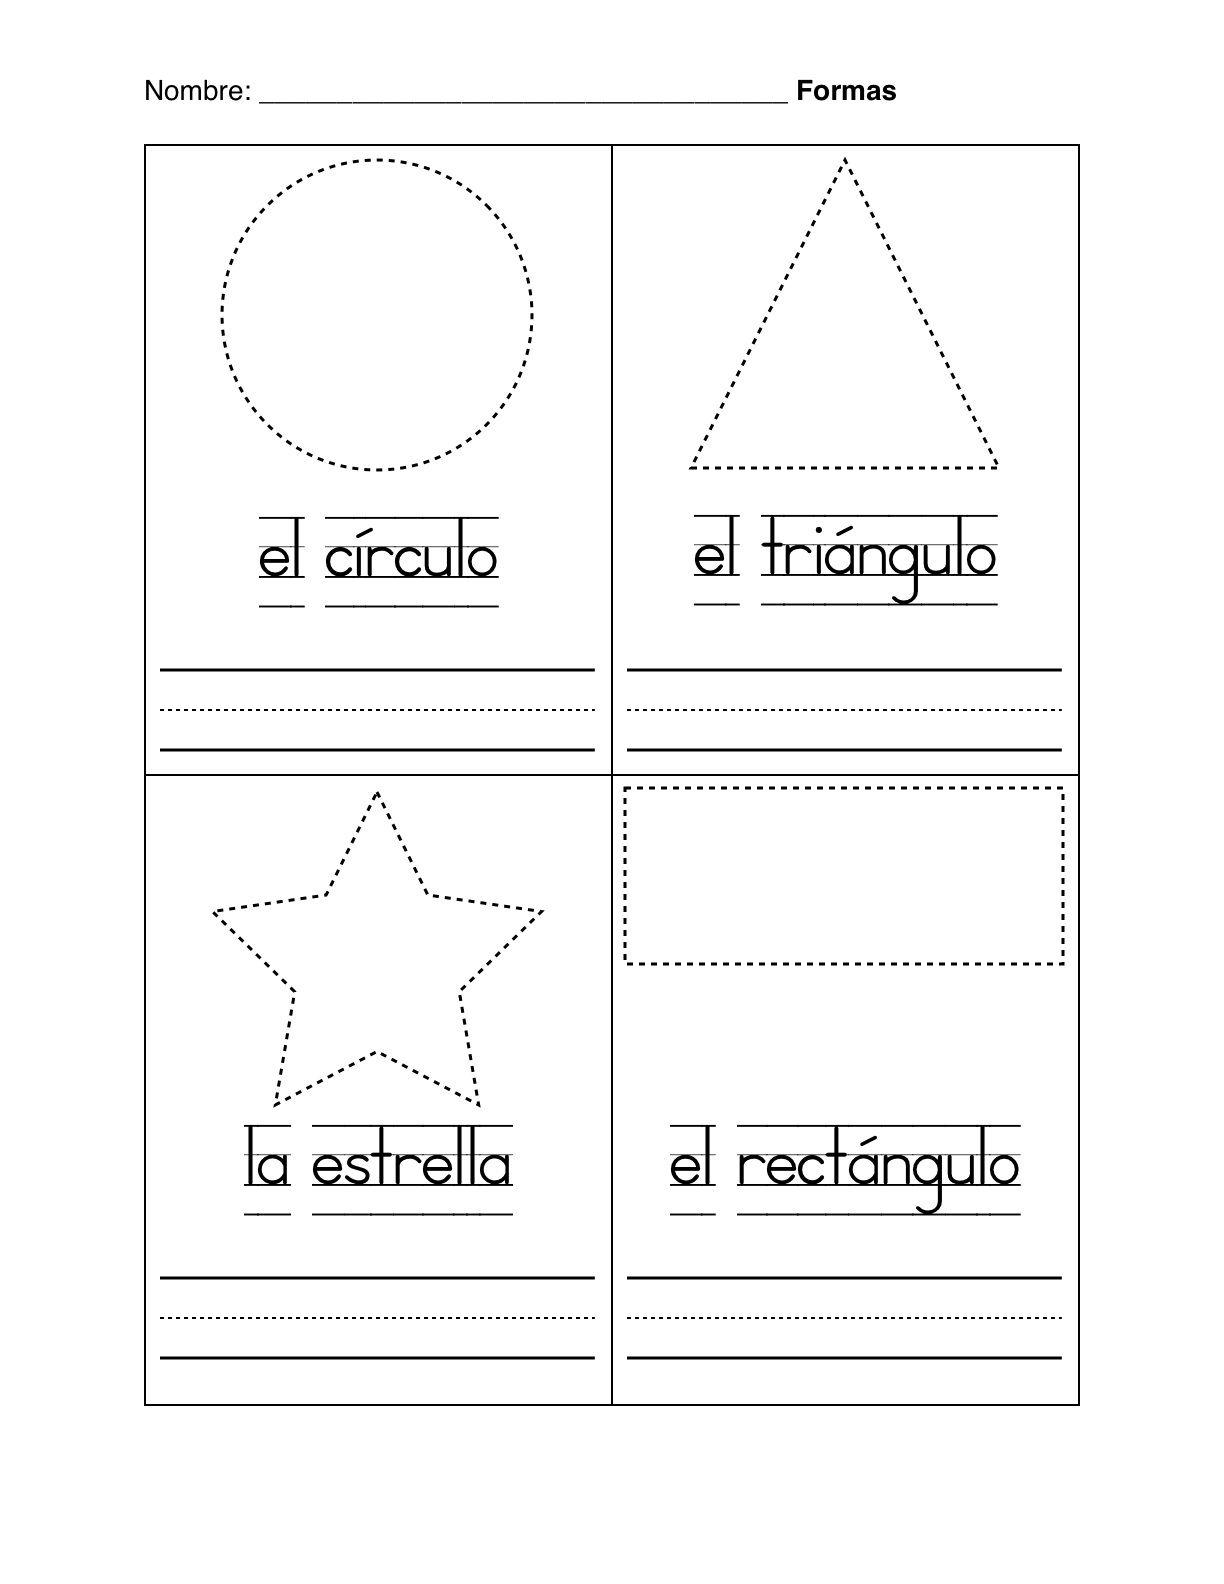 Spanish Worksheets For Kindergarten | Basic Shapes In